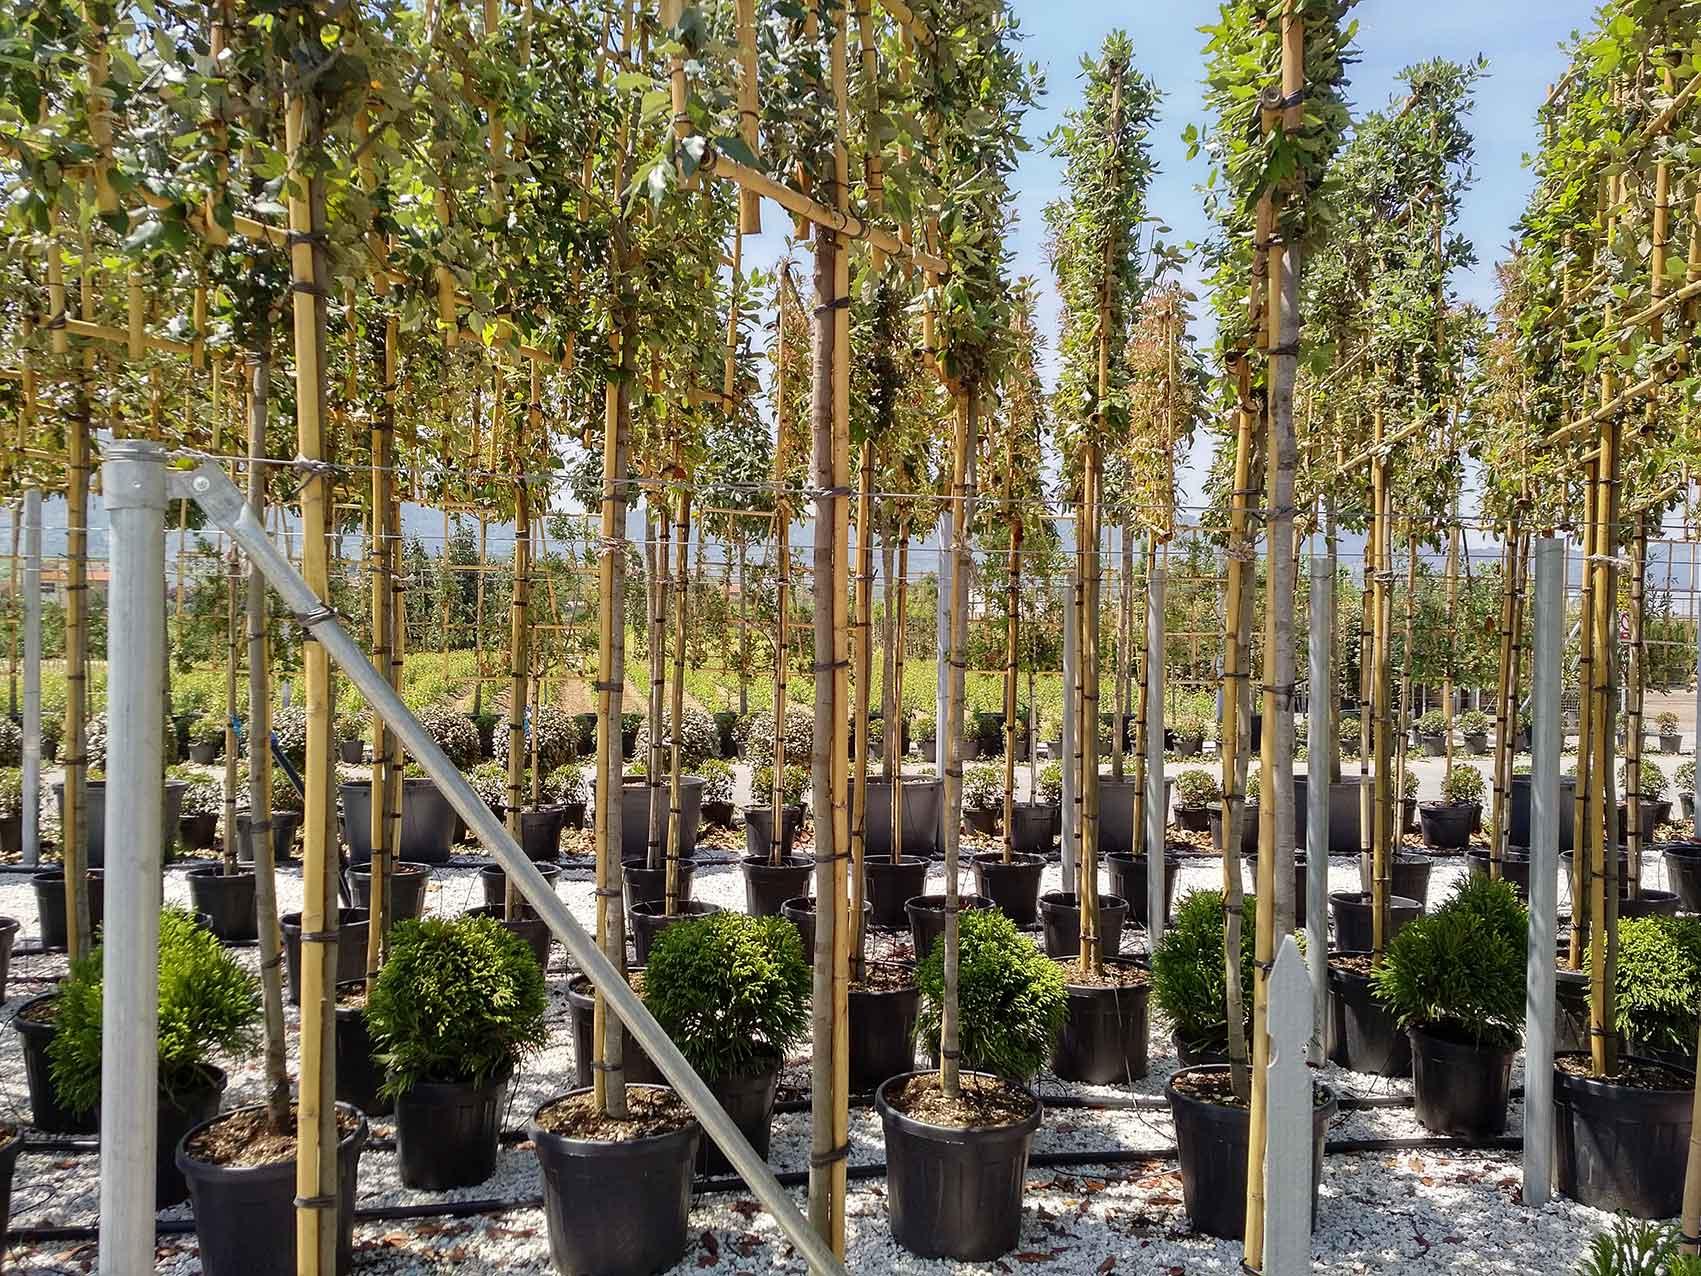 Binding Tube support bamboo stake